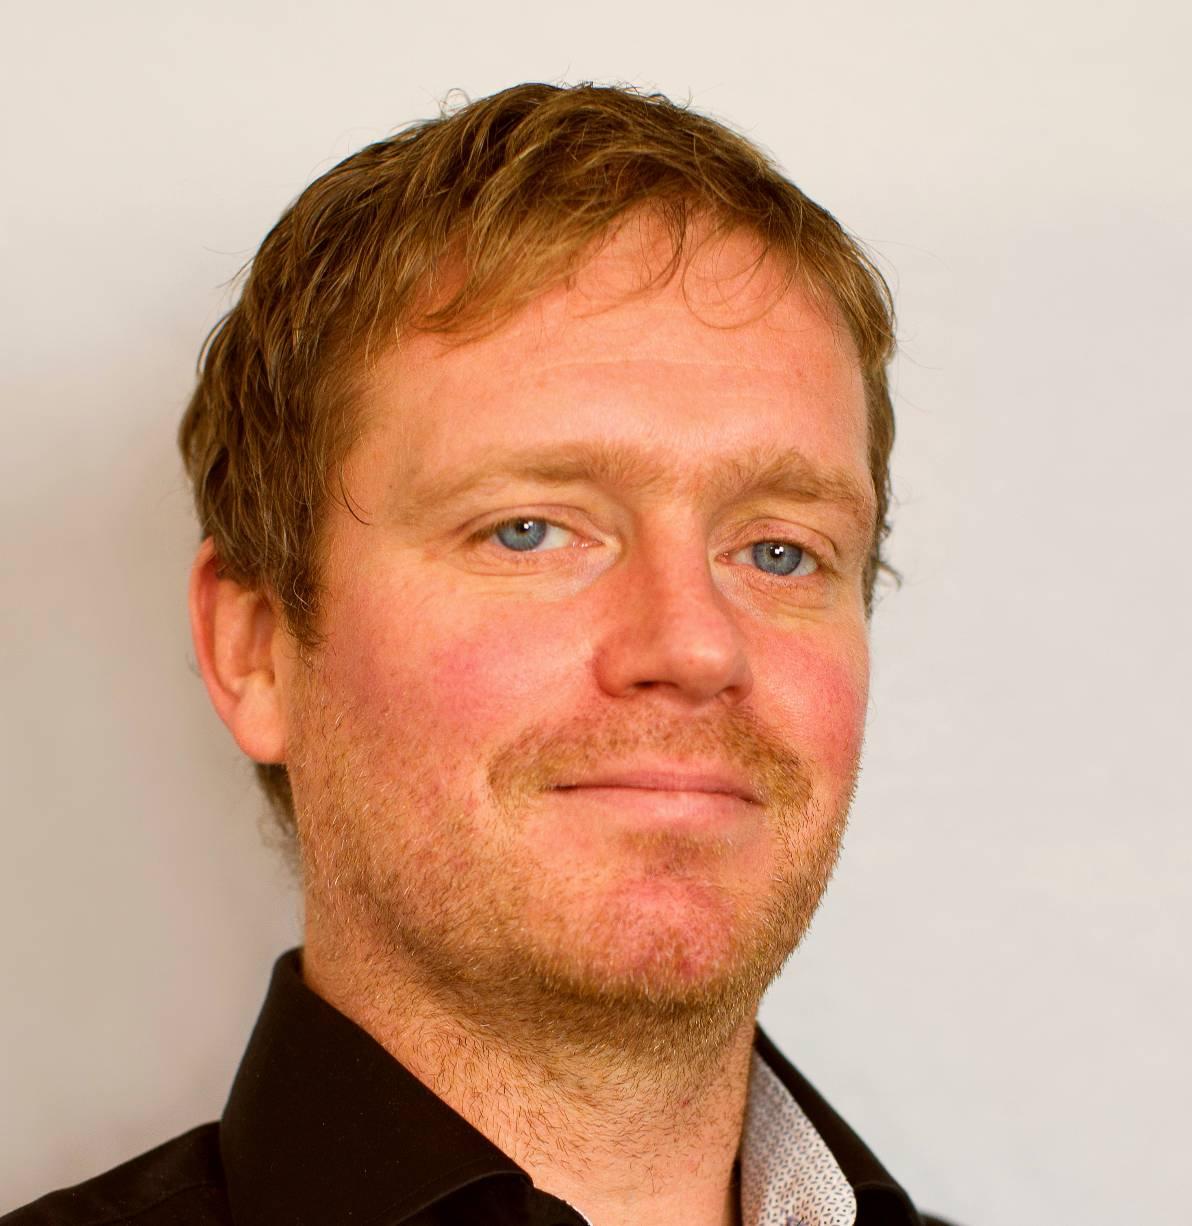 Gunnar Stjernberg